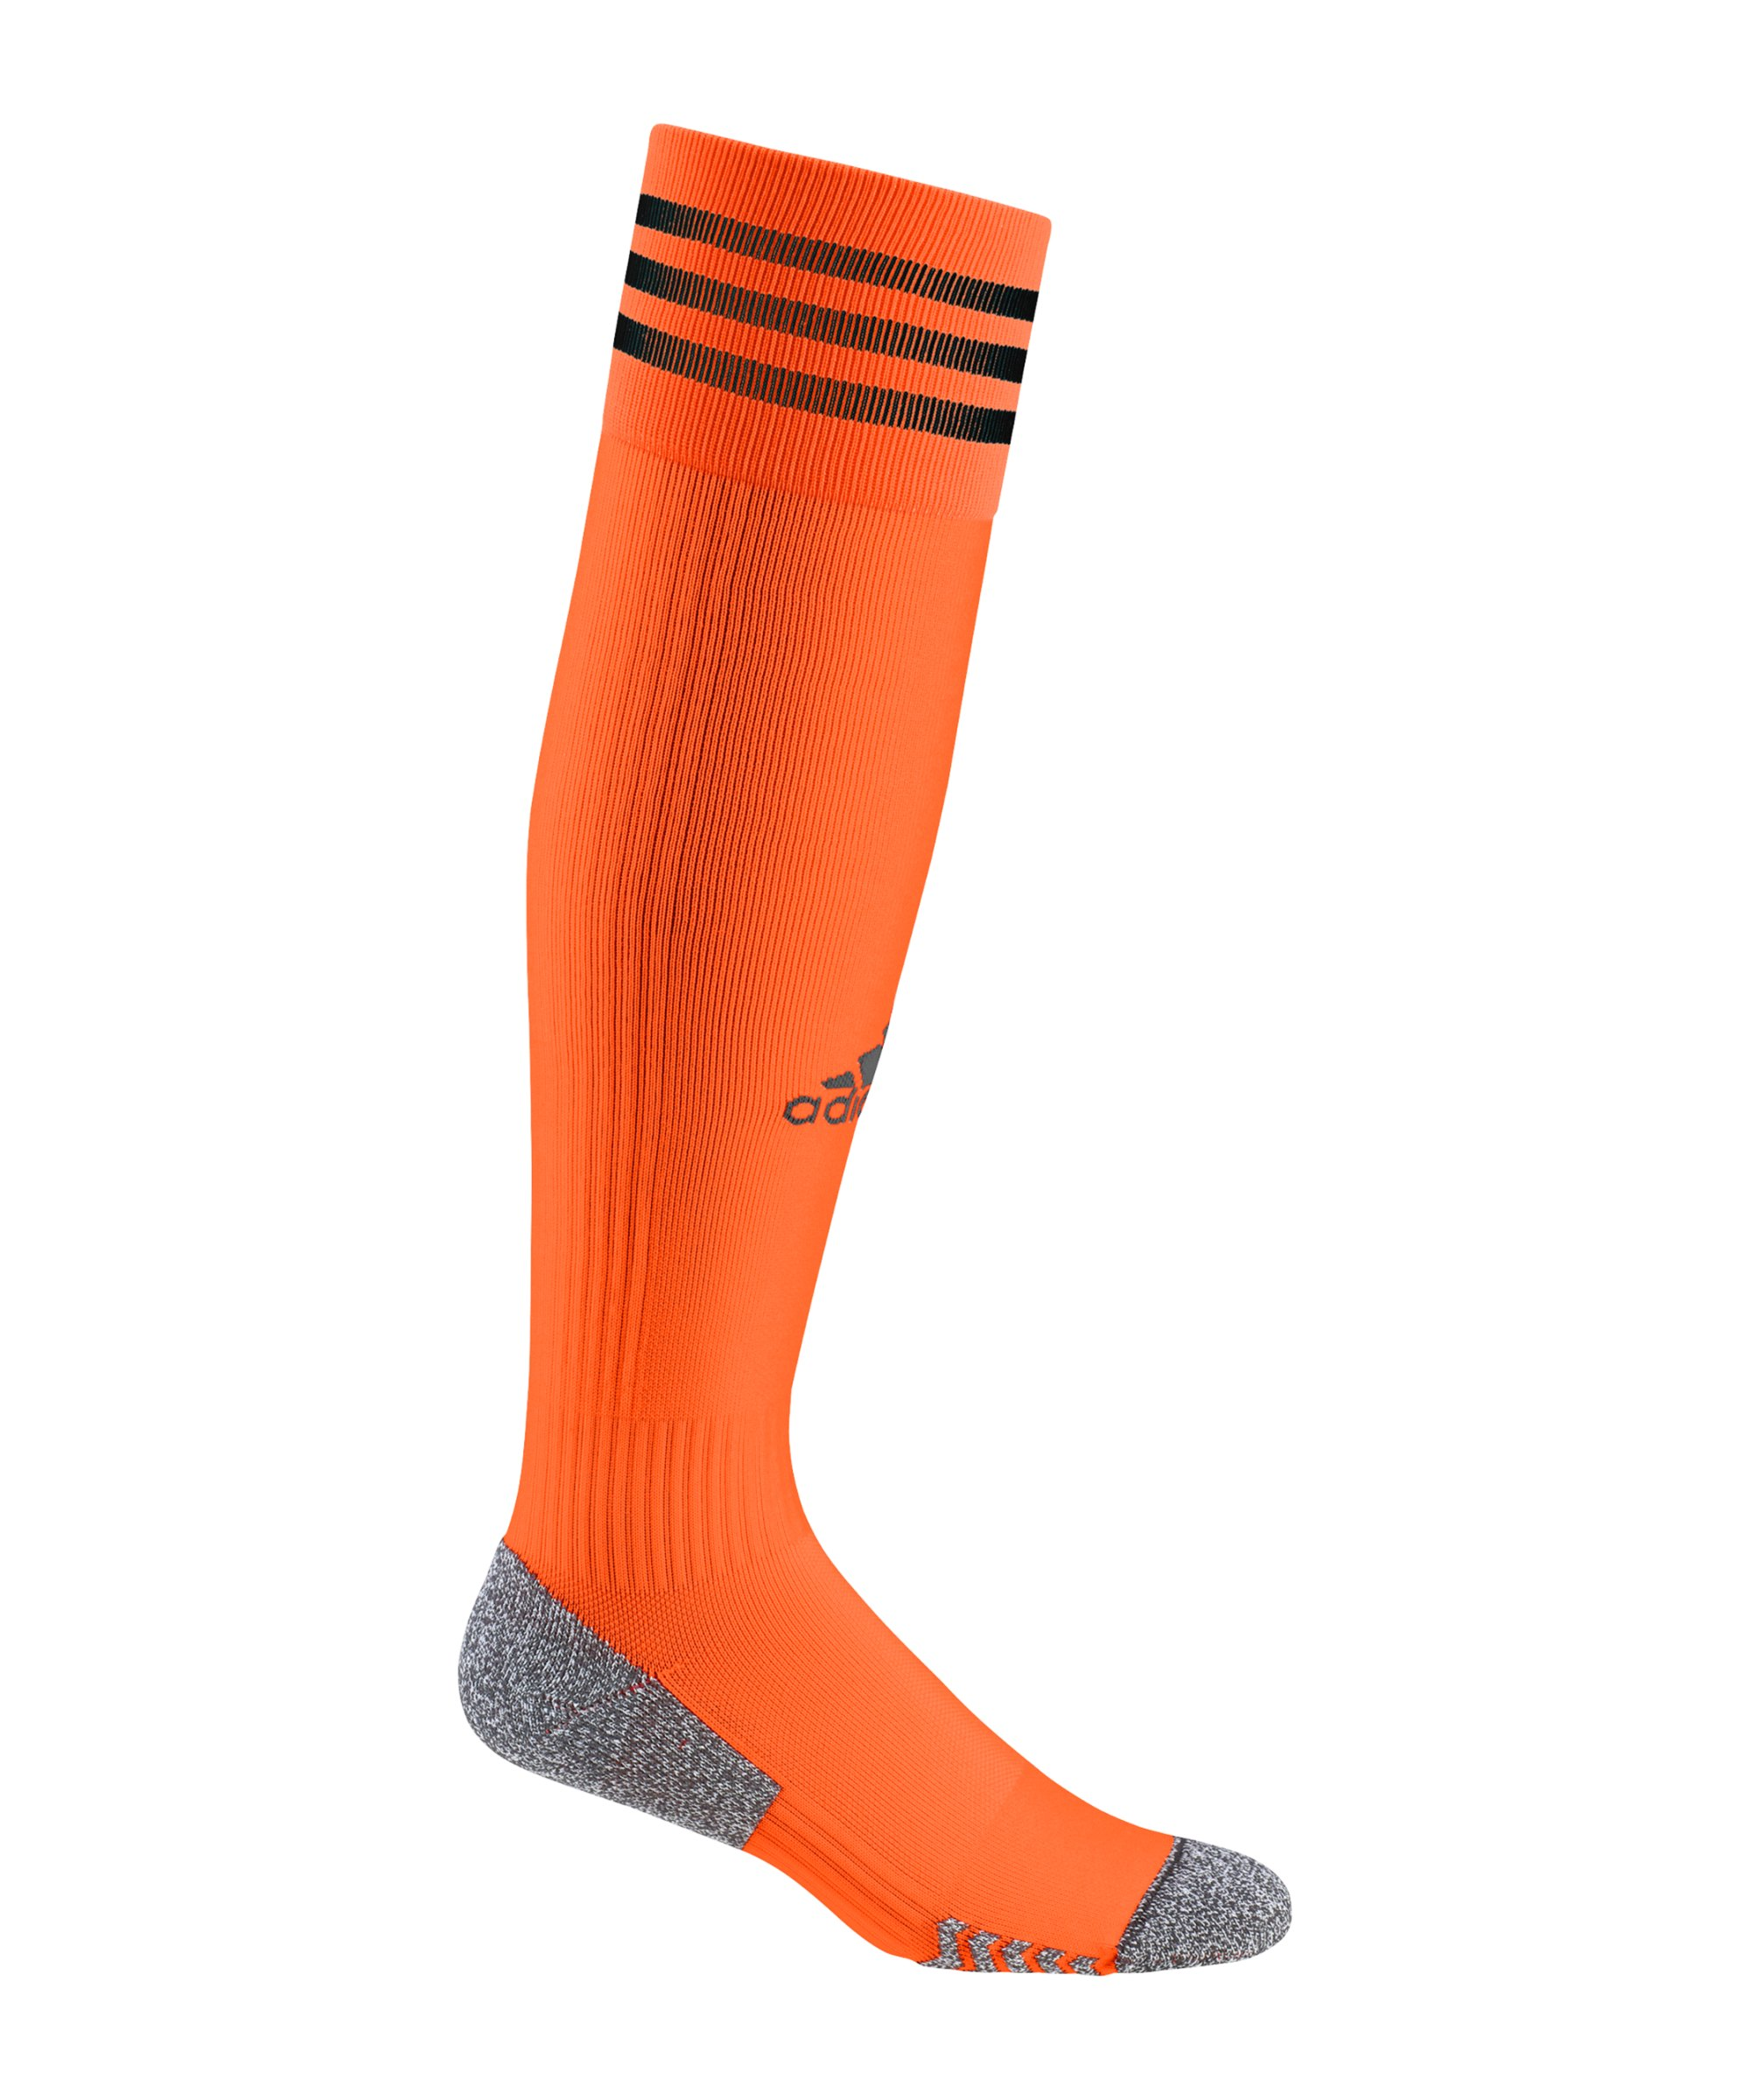 adidas Adisock 21 Stutzenstrumpf Orange Schwarz - orange